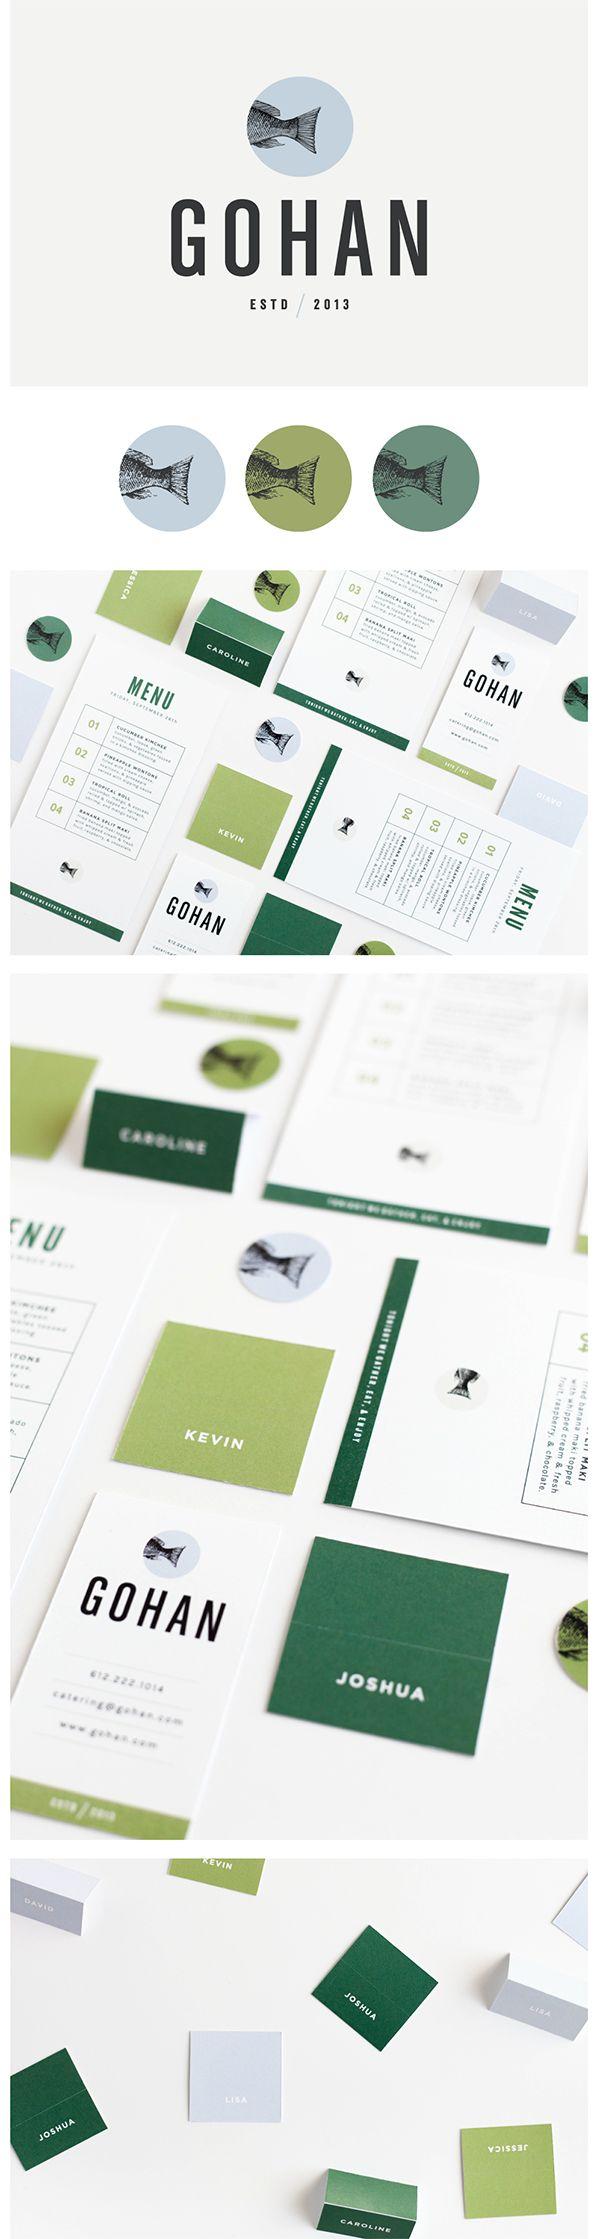 #identity #packaging #branding PDhttp://interiorhousedesign731.blogspot.com